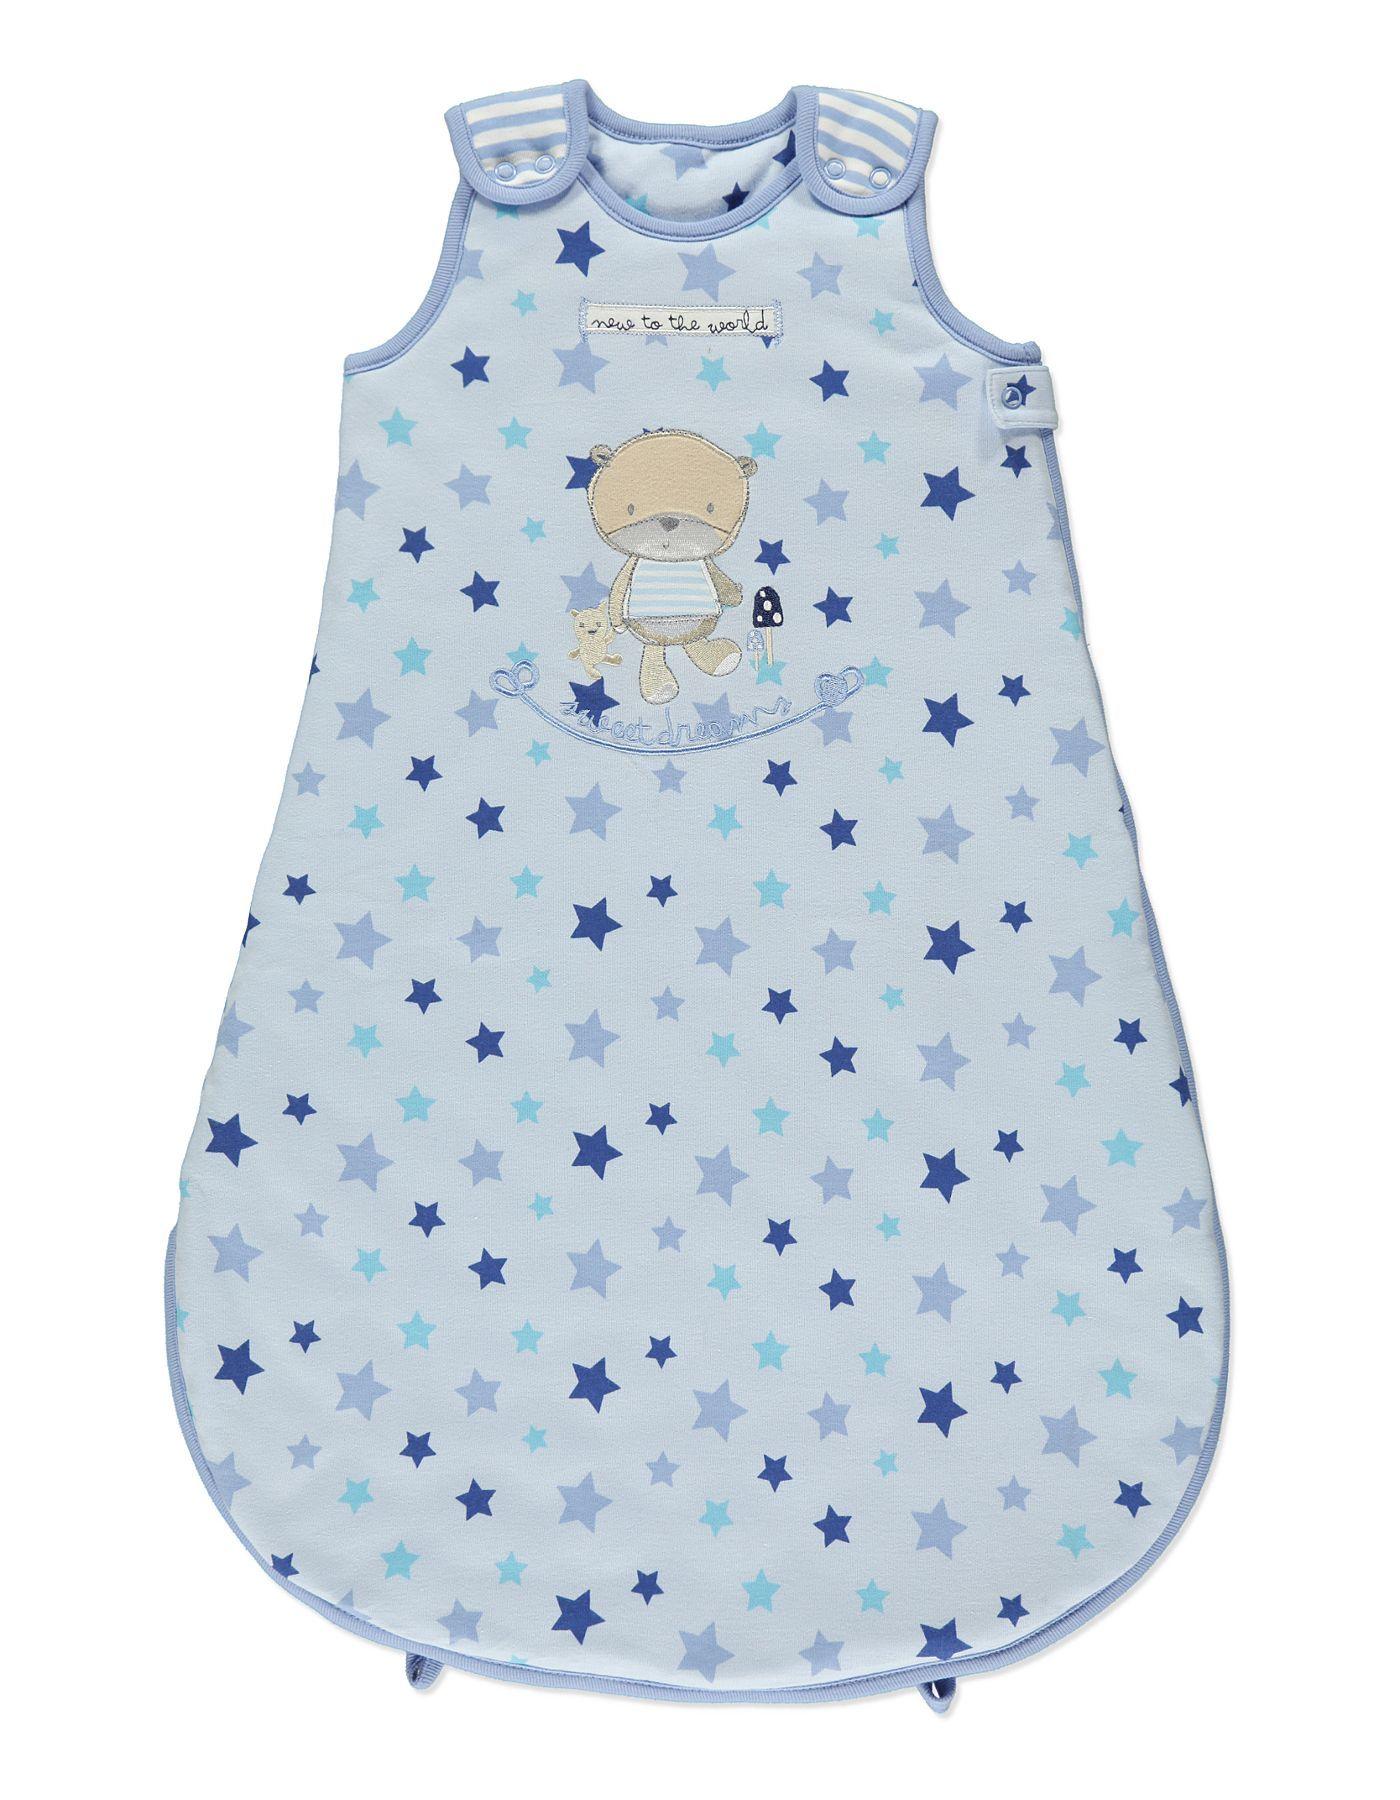 outlet store 6e970 b5e4a Max Sweet Dreams Sleeping Bag | Baby | George at ASDA | baby ...